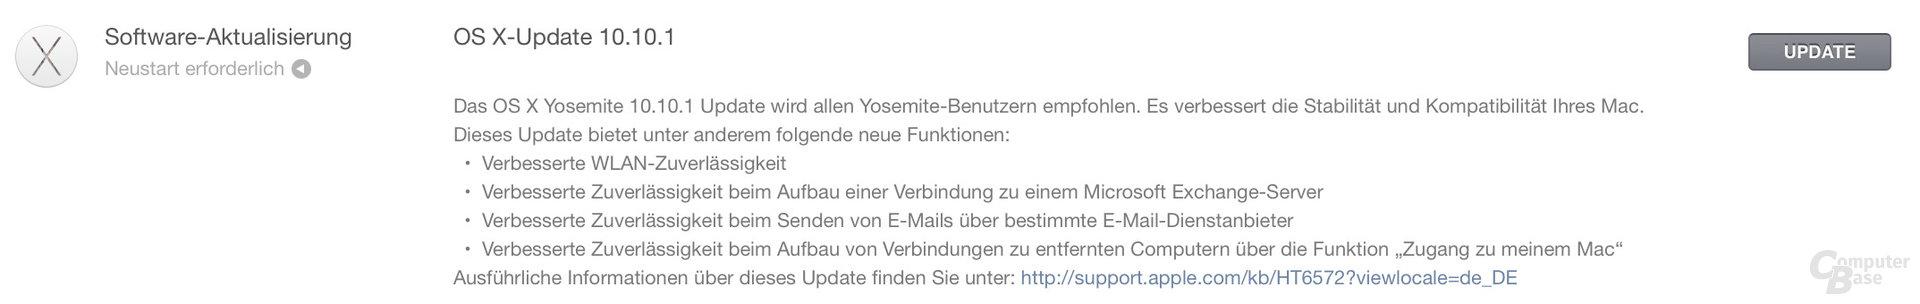 OS X Yosemite Update auf 10.10.1